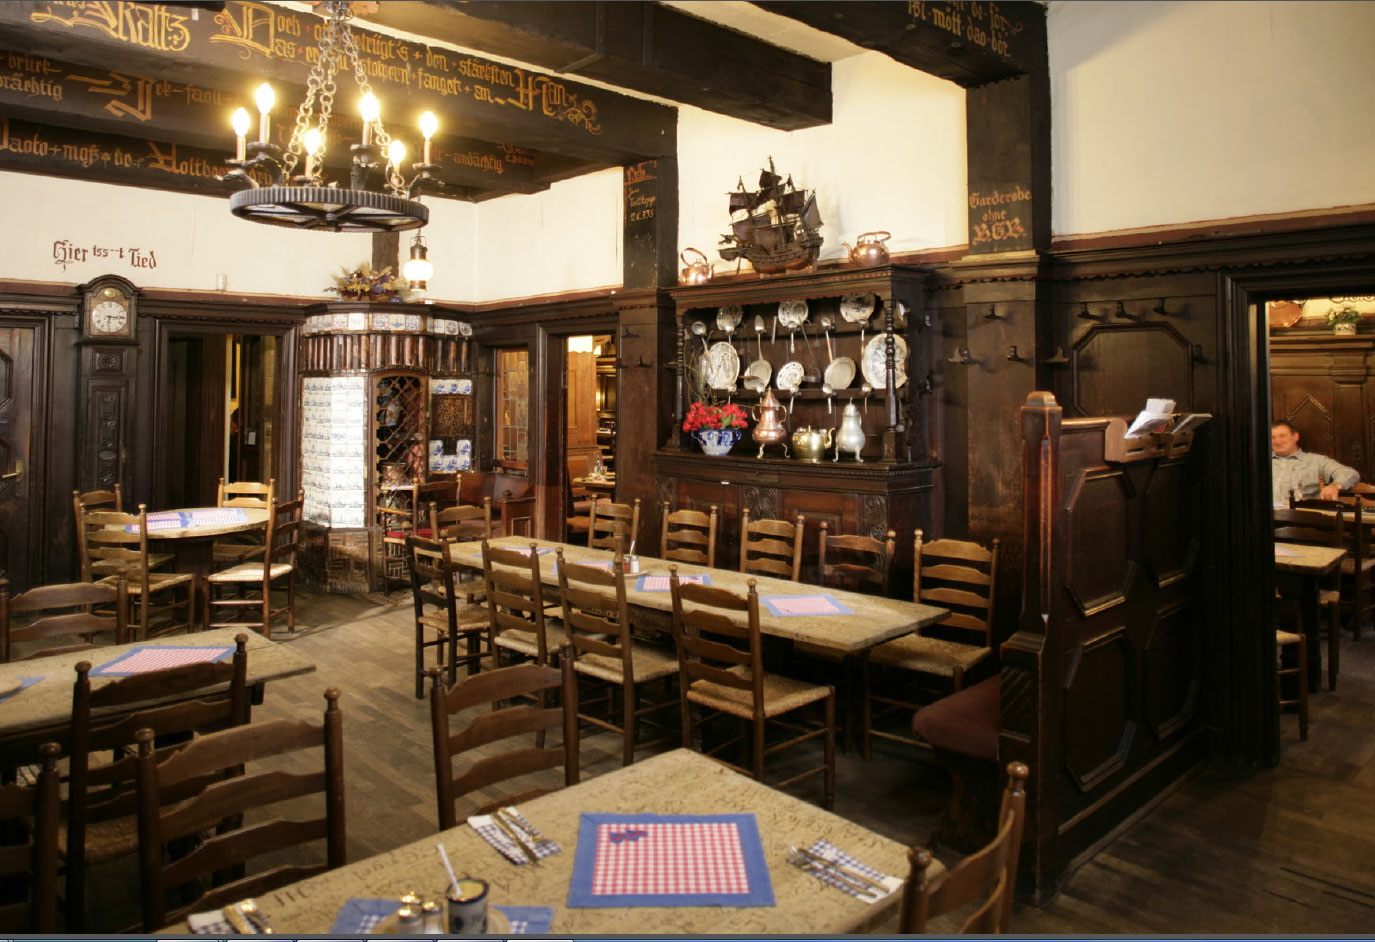 pinkus m ller altbierk che m nster restaurant restaurant deutsche k che m nster typisch. Black Bedroom Furniture Sets. Home Design Ideas